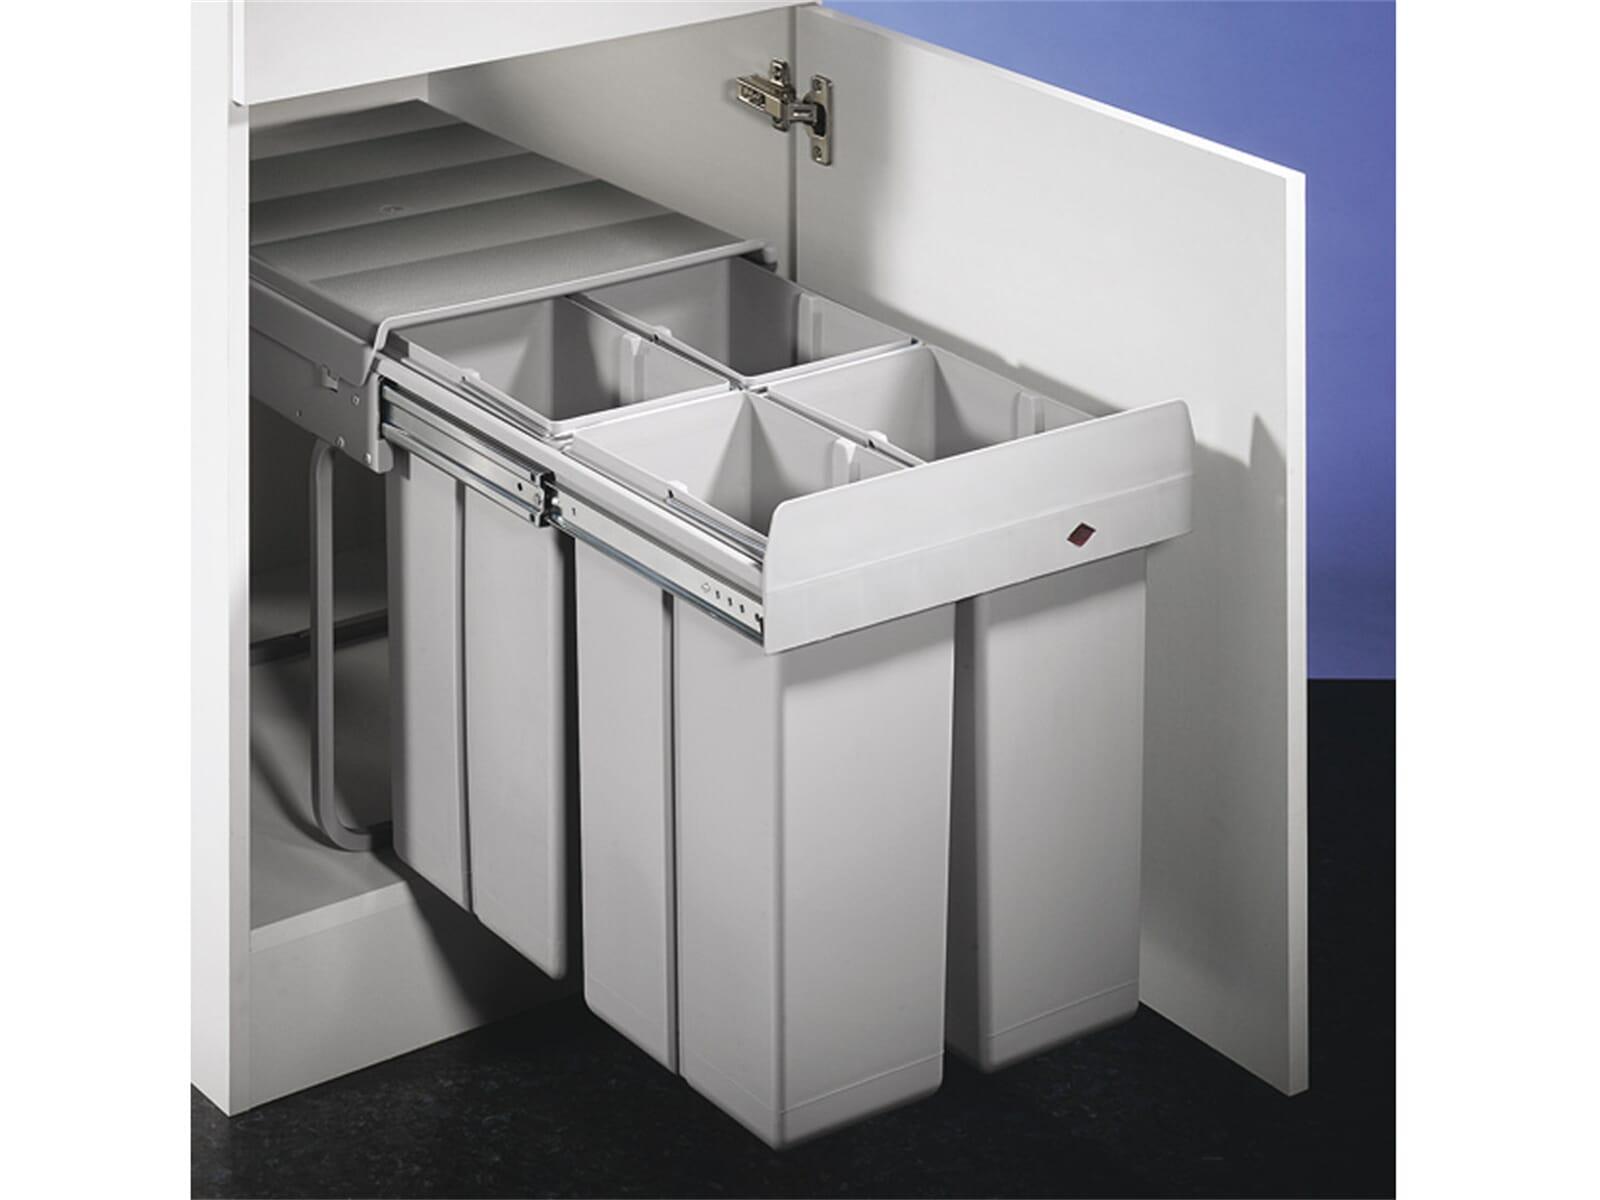 naber quarta 1 einbau abfallsammler f r 98 90 eur shop. Black Bedroom Furniture Sets. Home Design Ideas